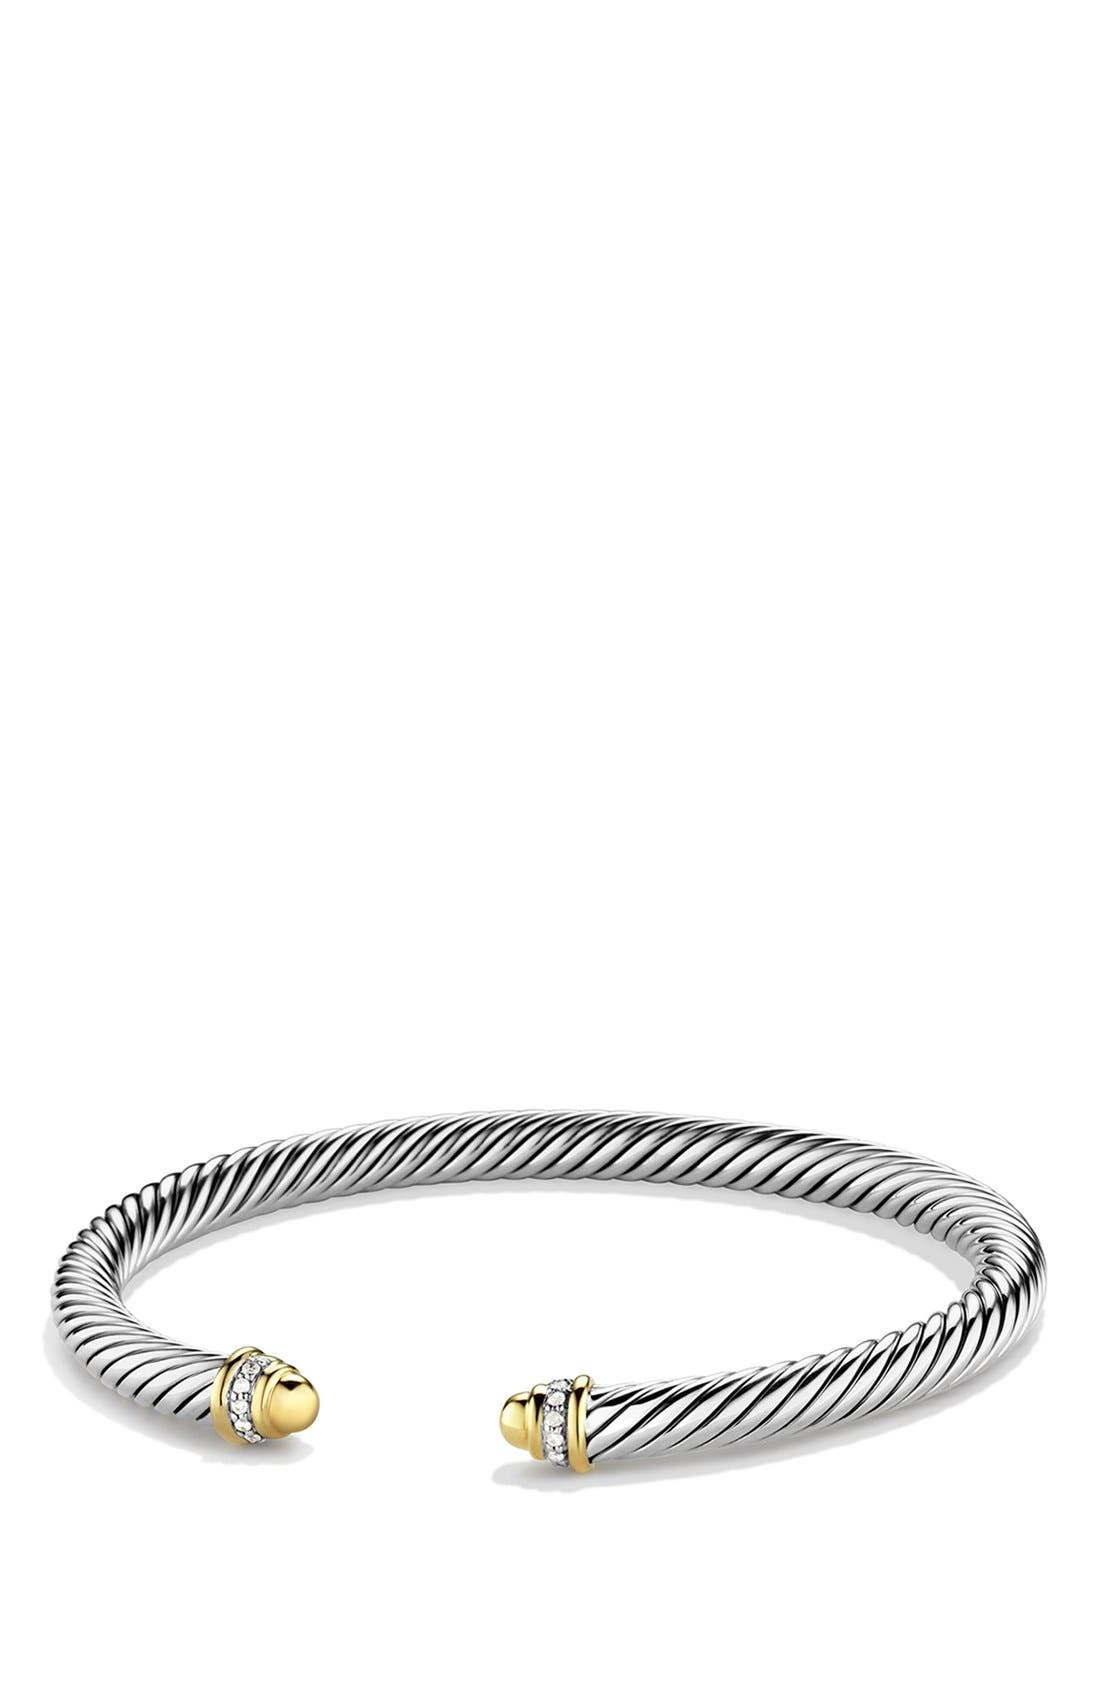 Main Image - David Yurman 'Cable Classics' Bracelet with Gold Domes and Diamonds